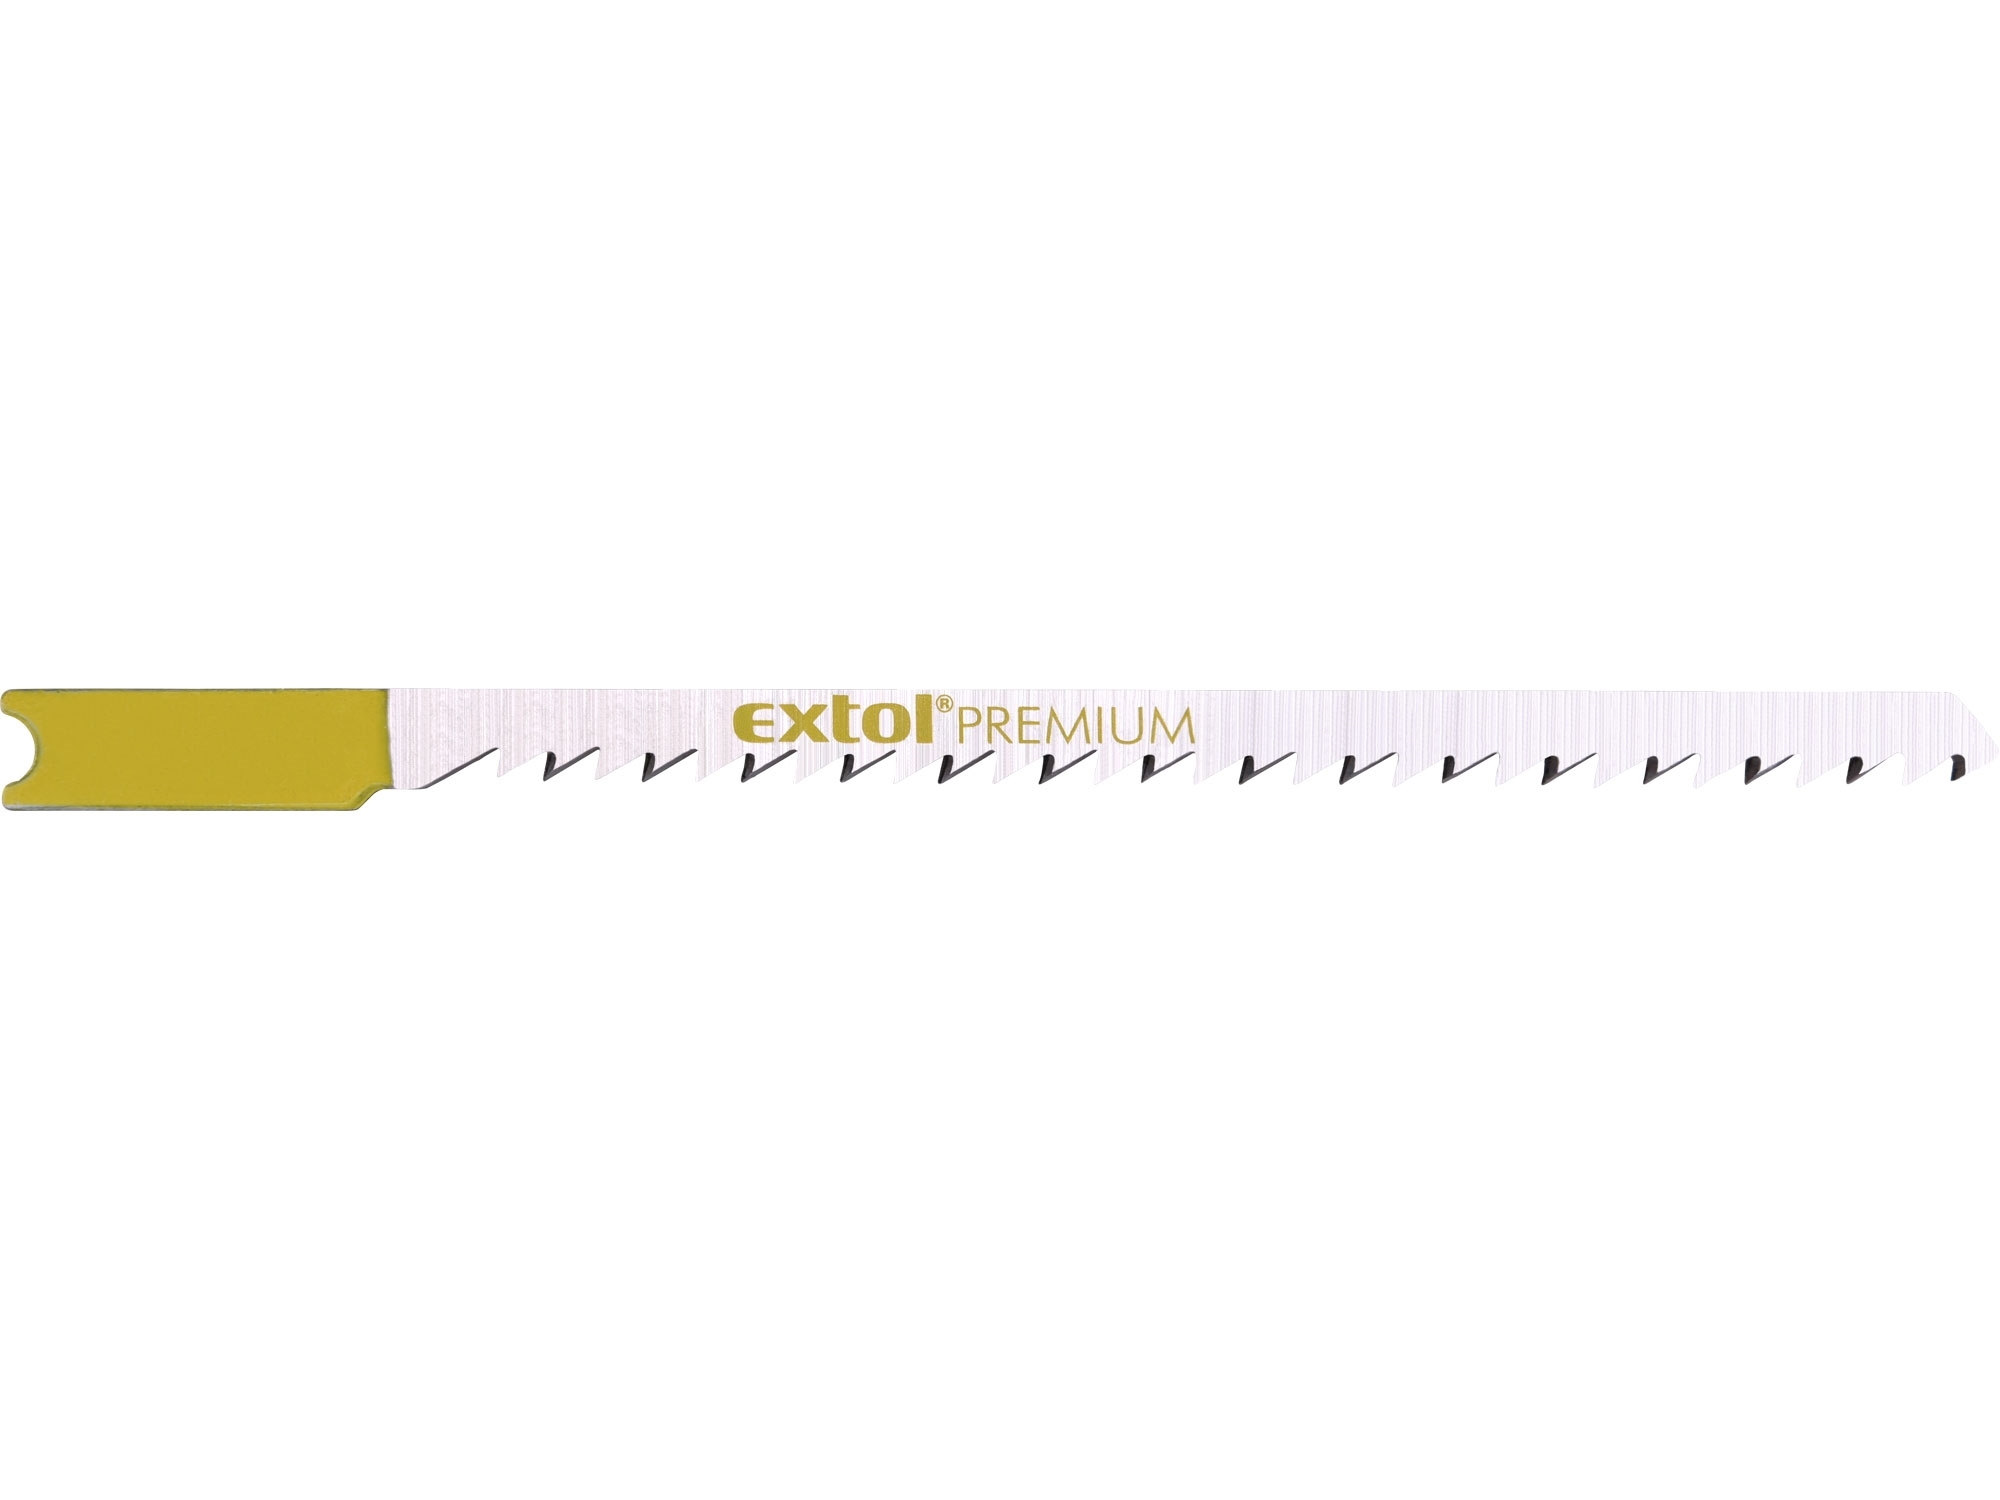 plátky do přímočaré pily 5ks, 75x2,5mm, HCS